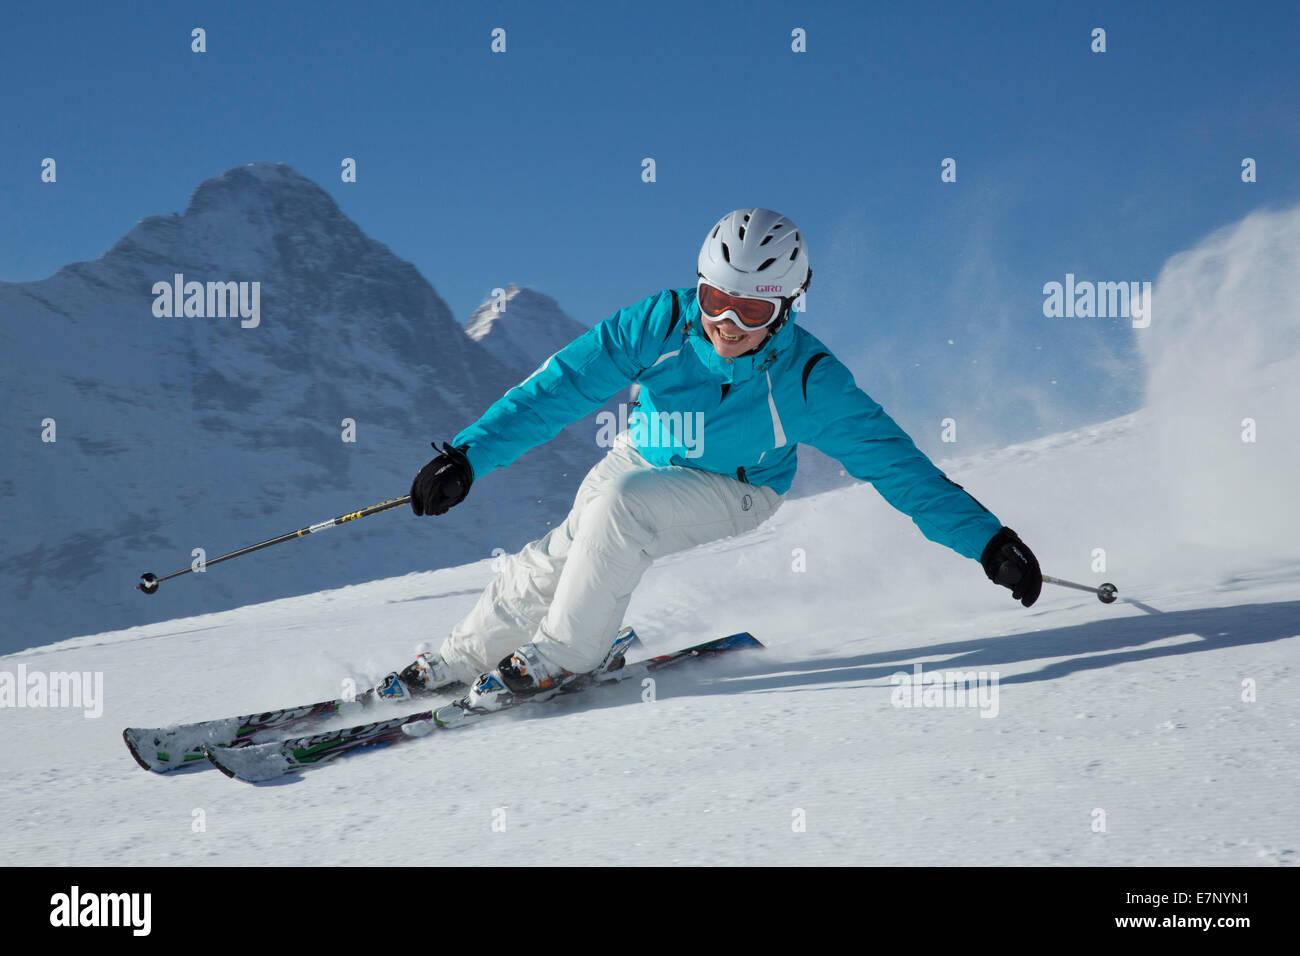 Ski, Skifahren, Grindelwald, Grat, Eiger, Jungfrau, Berg, Berge, Ski, Skifahren, Carving, Winter, Wintersport, Kanton Stockbild